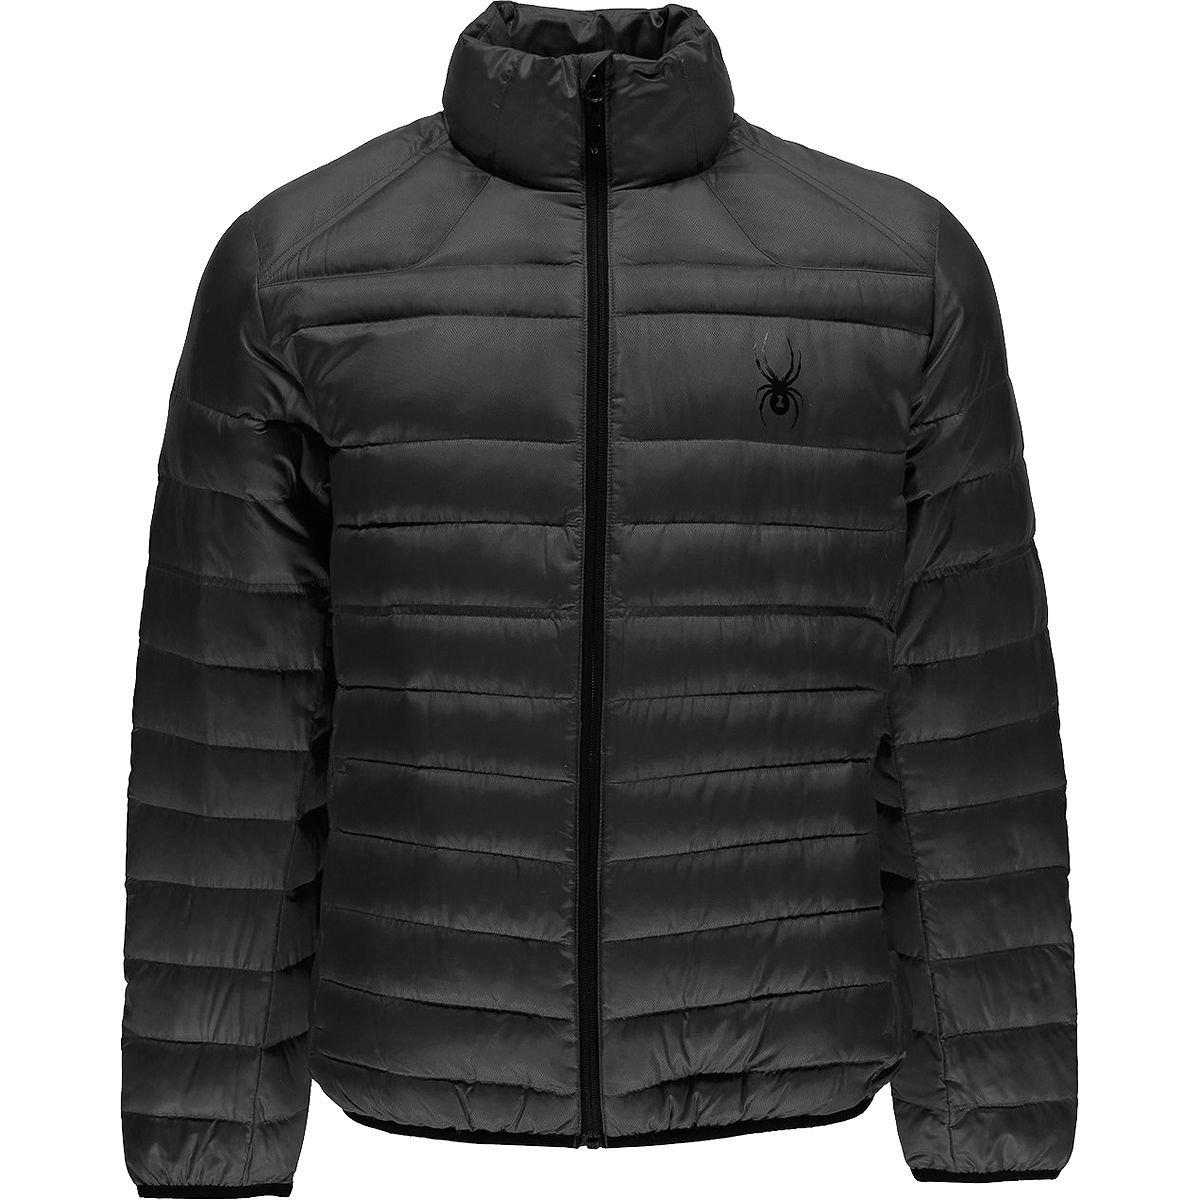 Spyder Prymo Down Jacket - Men's 162001-050-M